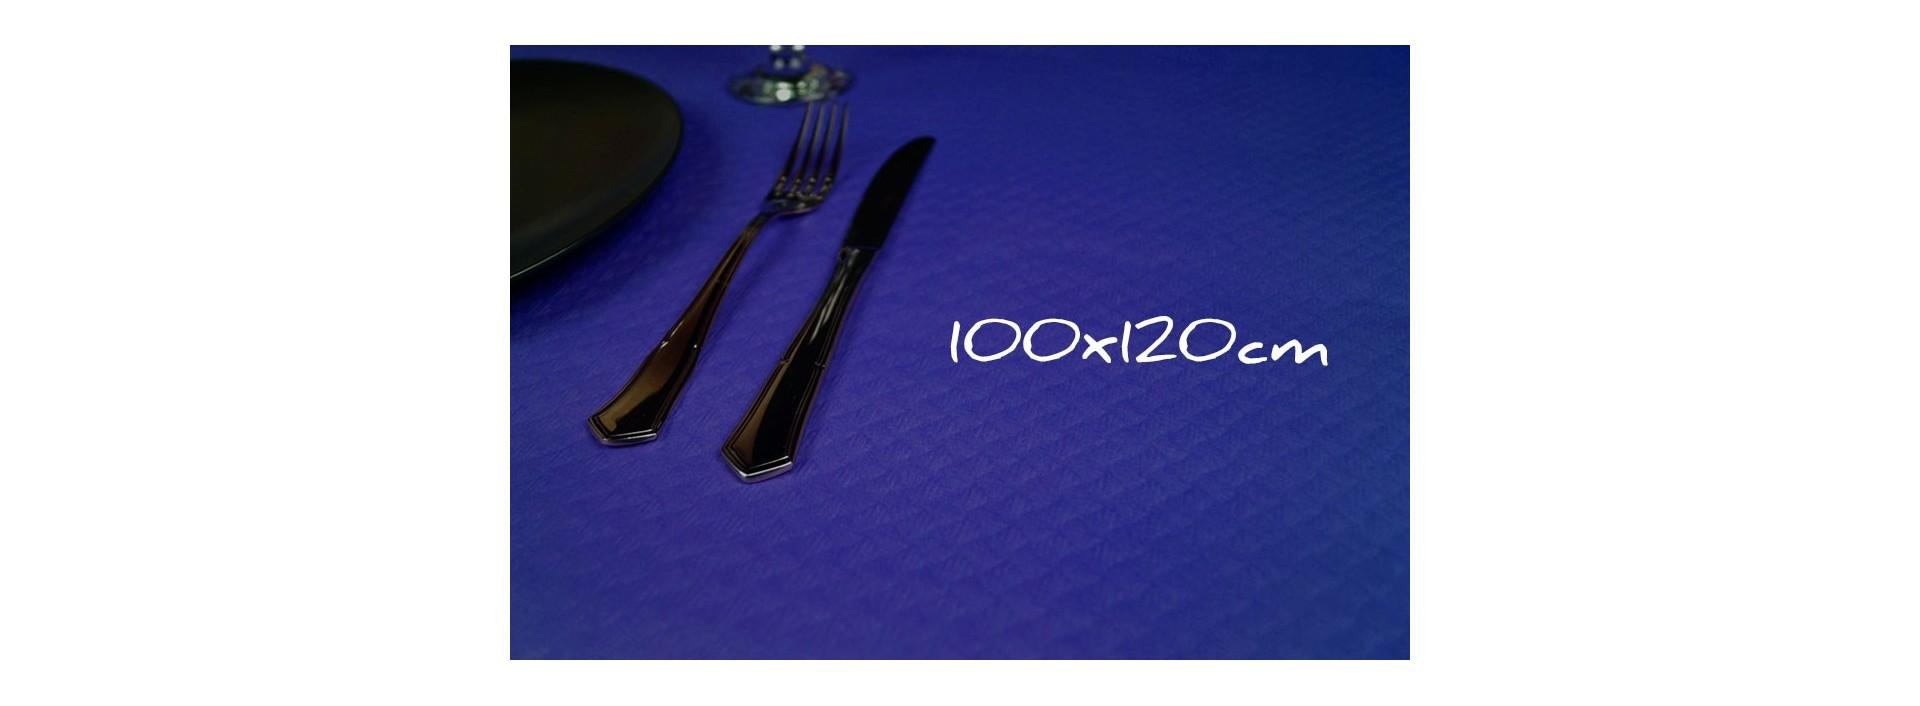 Mantel 100x120